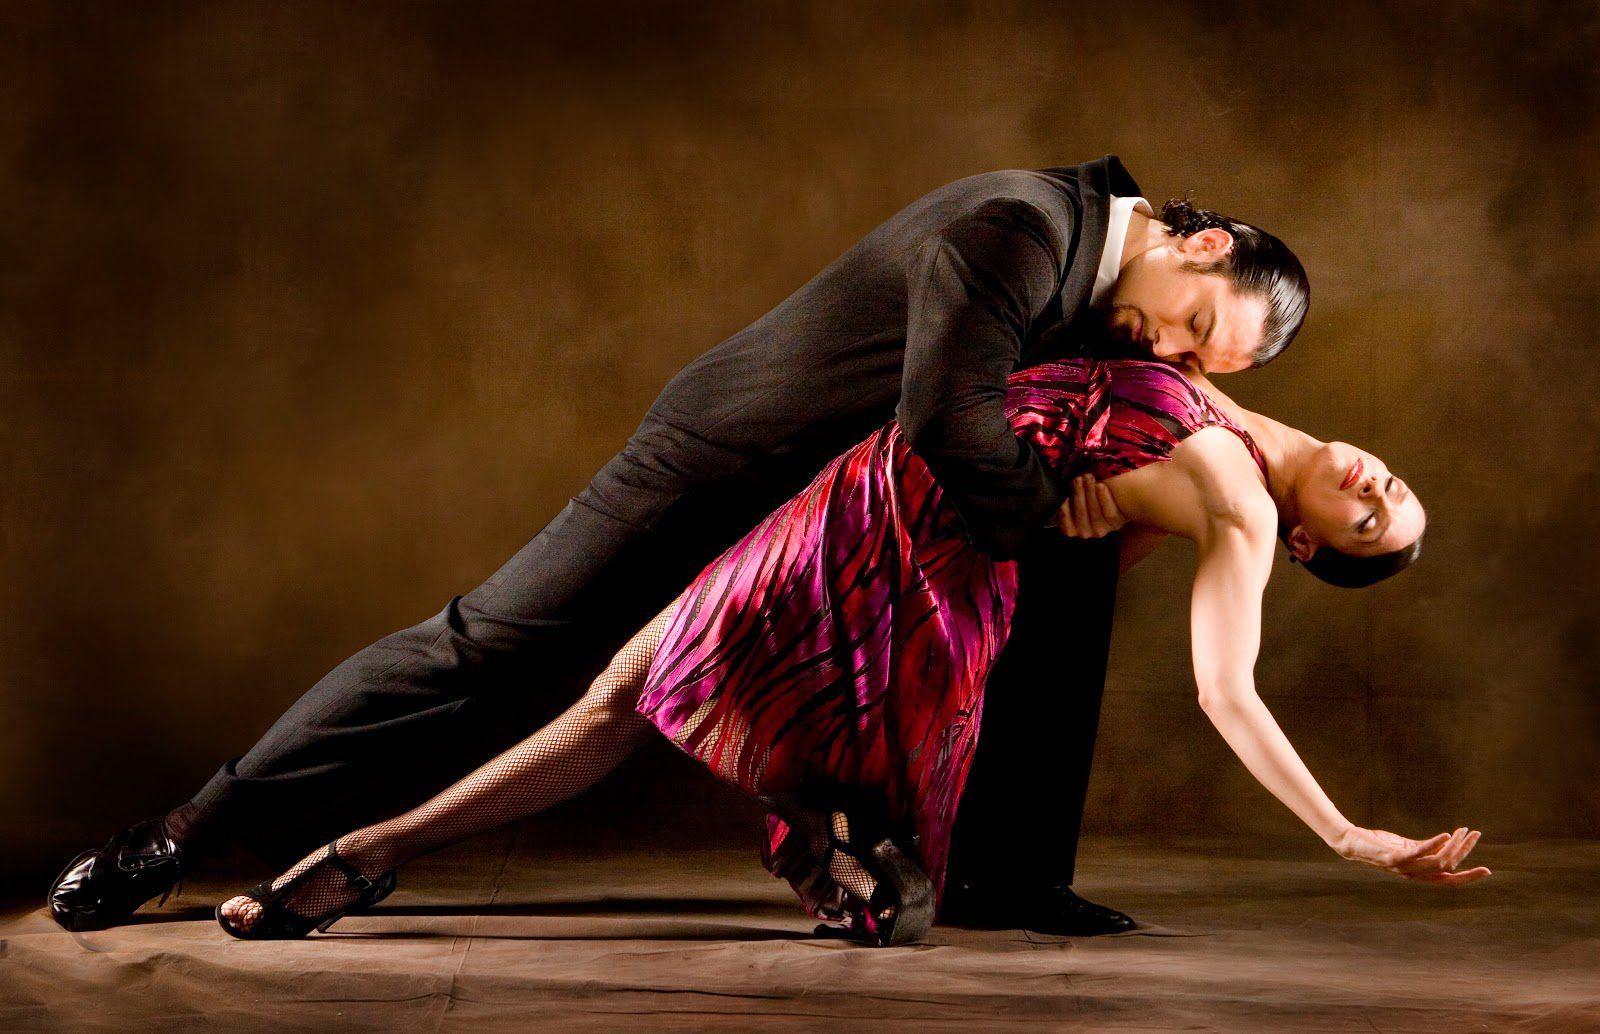 аргентинское танго картинки представителей